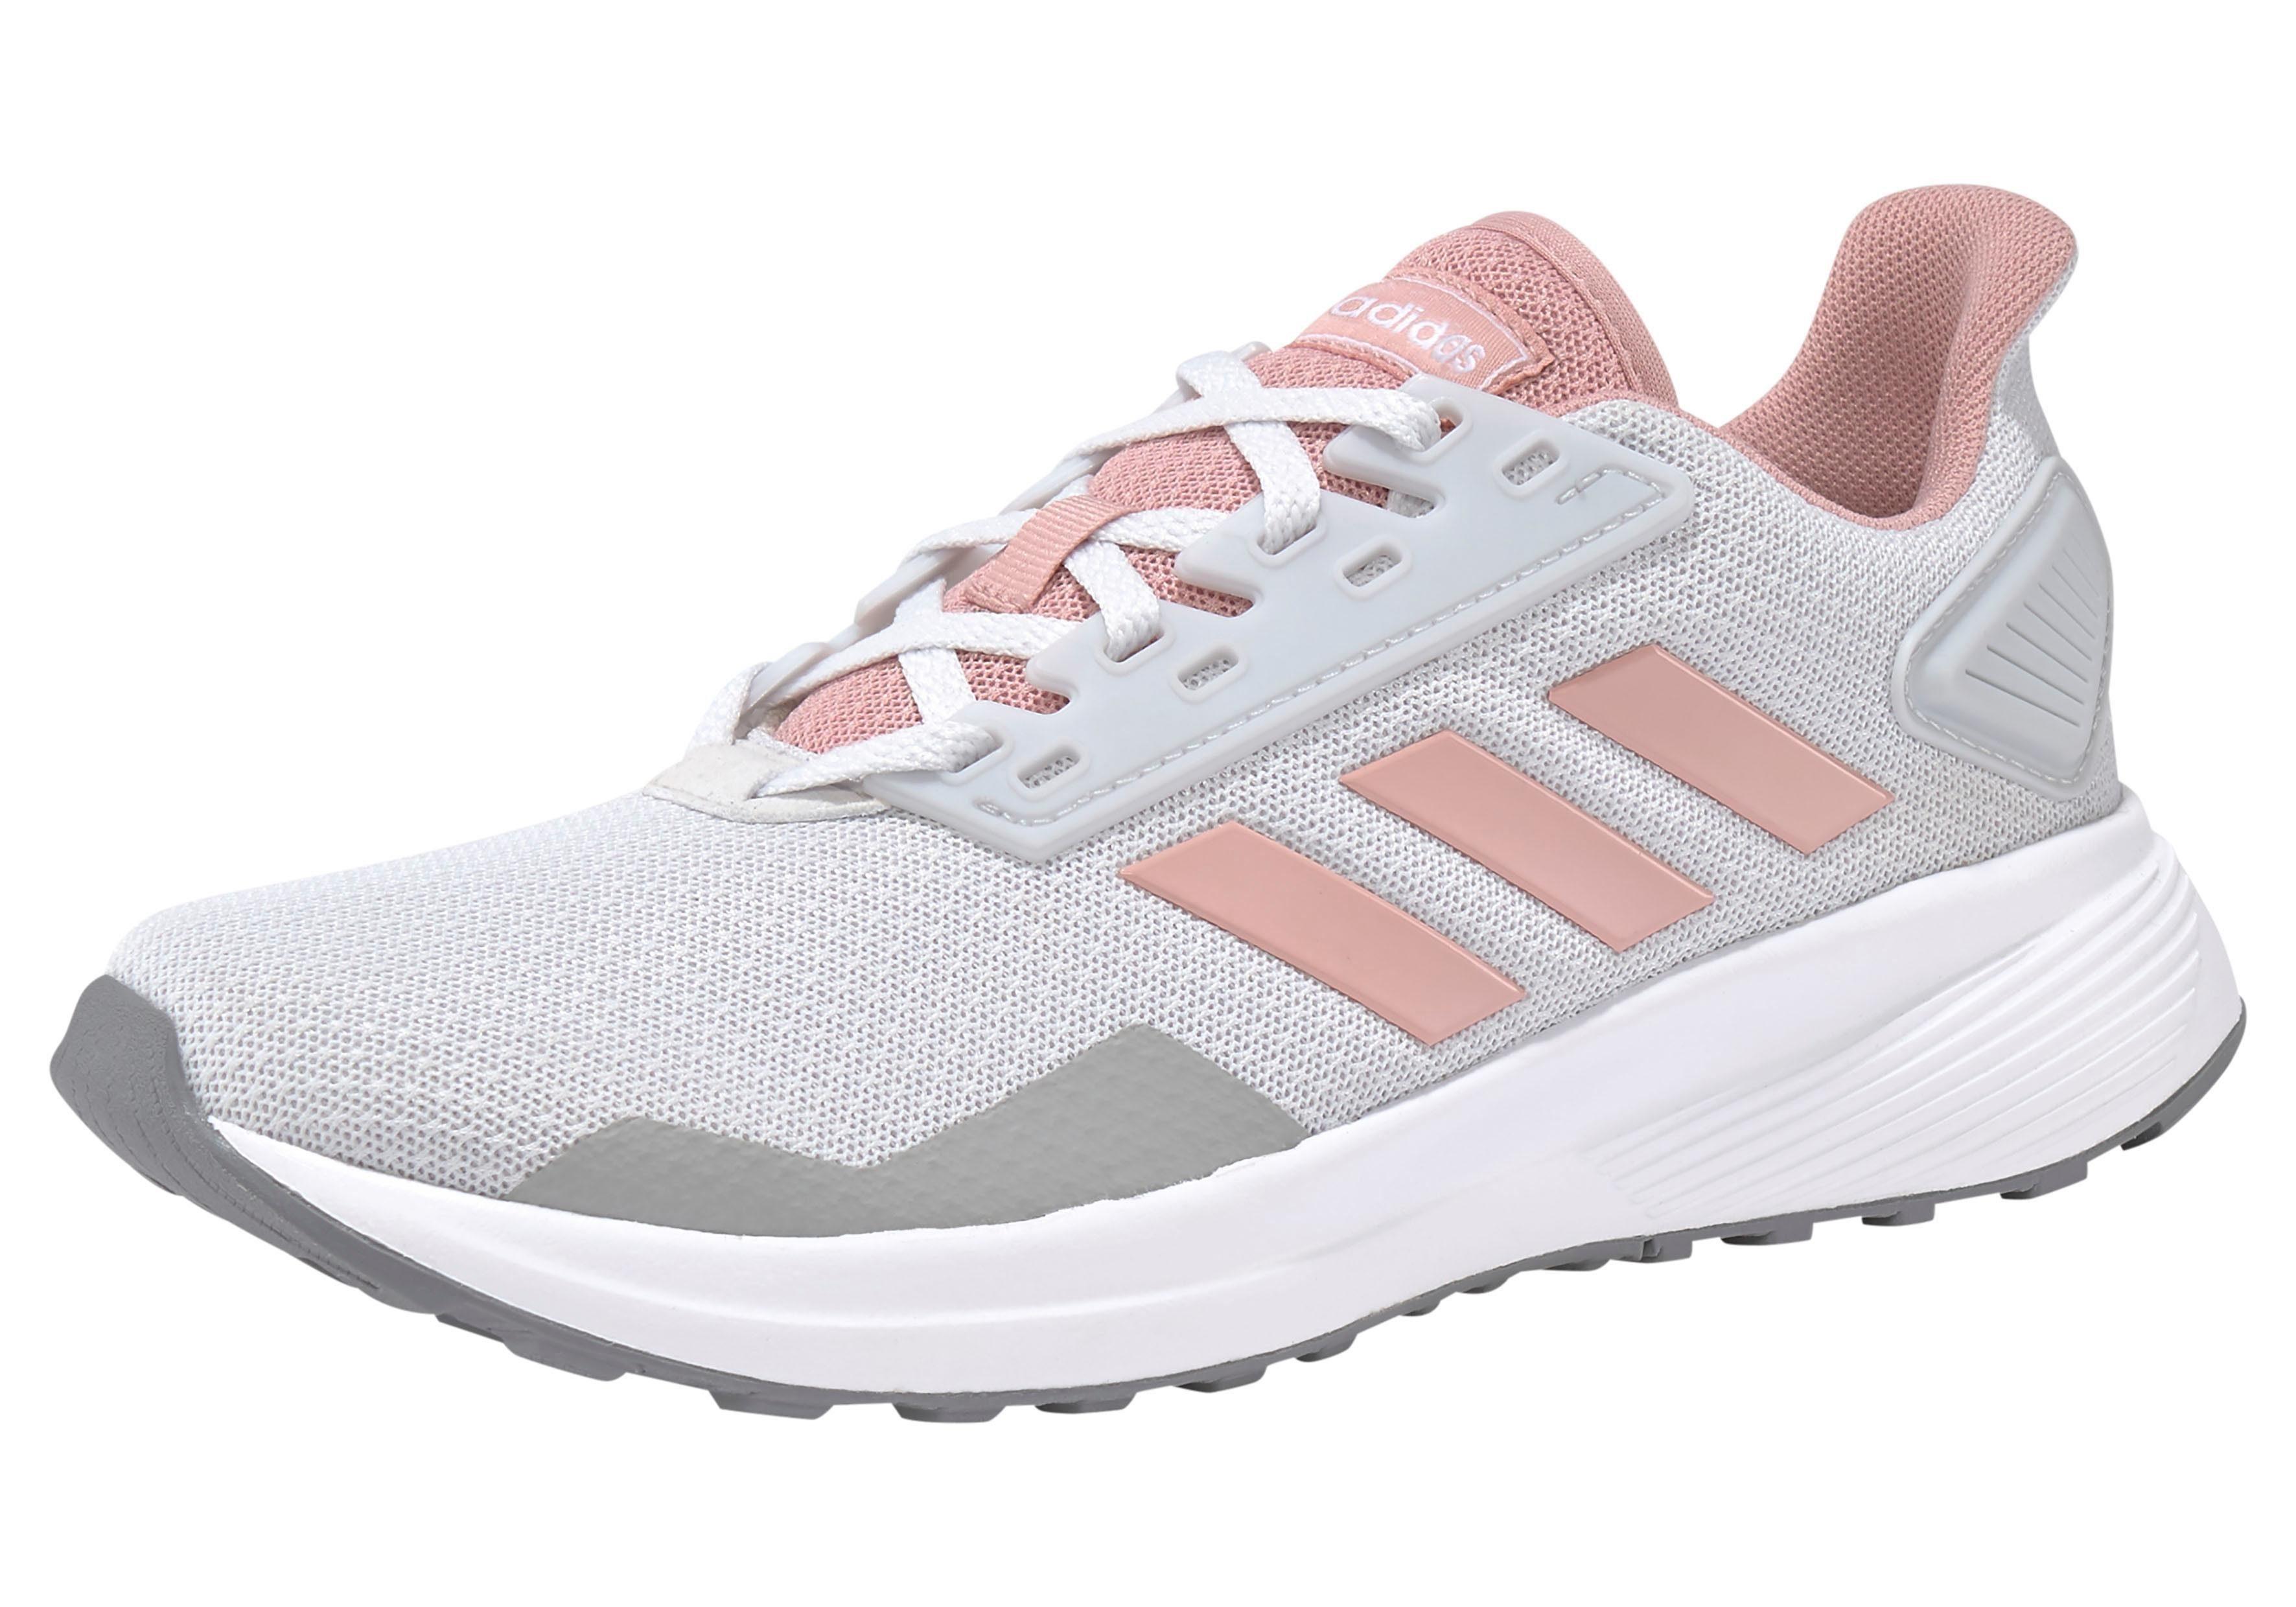 adidas Laufschuh DURAMO 9 Technik & Freizeit/Sport & Freizeit/Sportarten/Laufen/Lauf-Schuhe